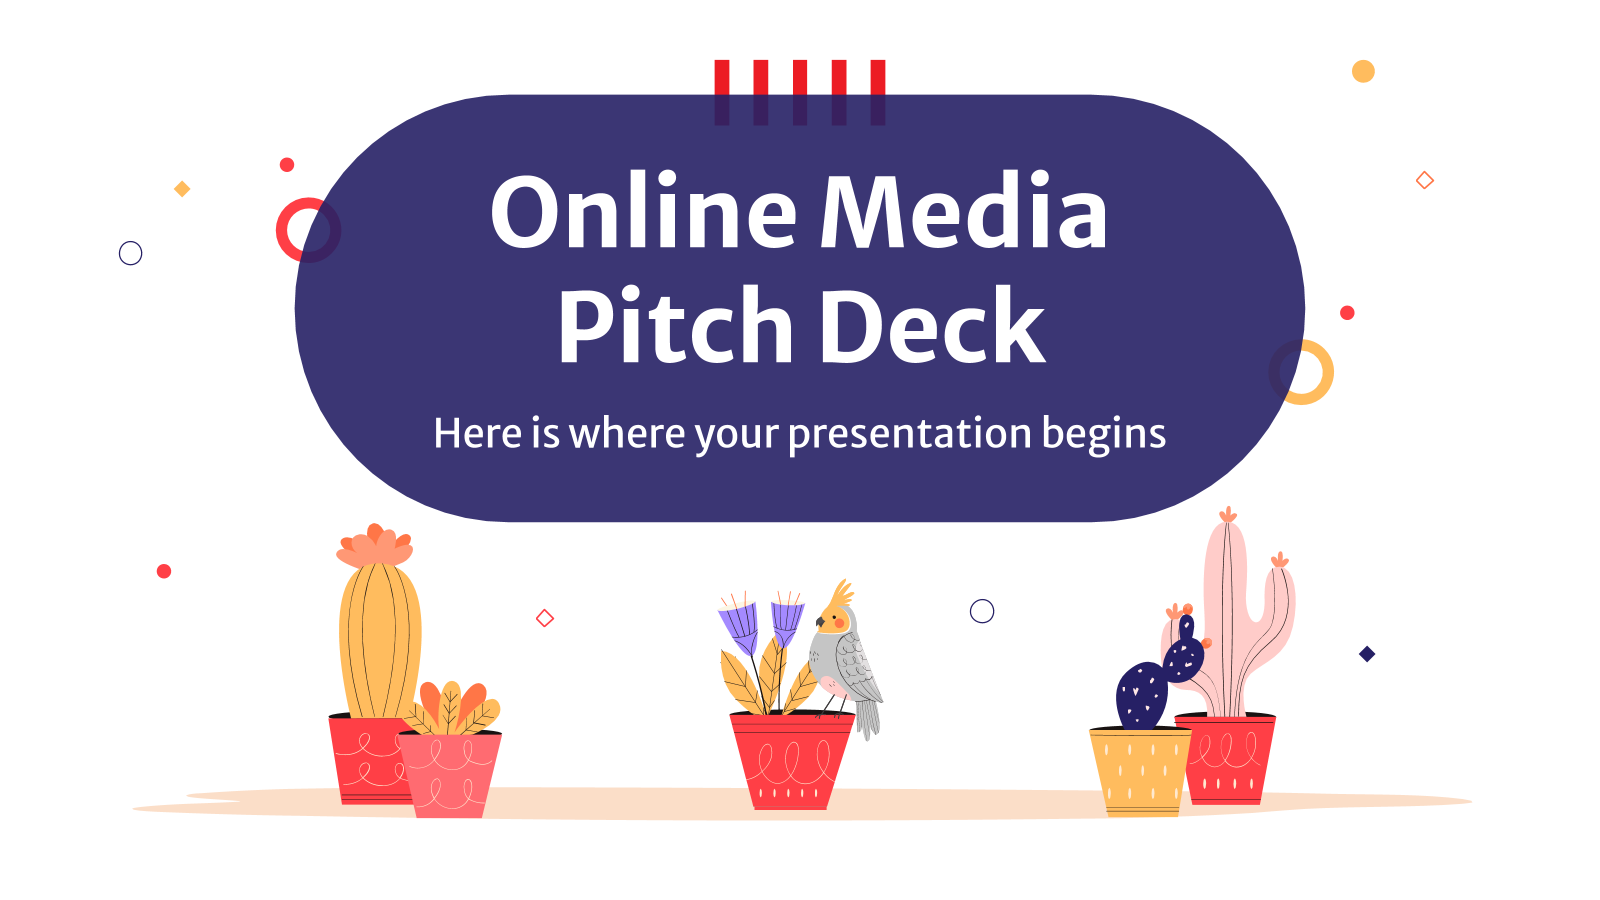 Online Media Pitch Deck presentation template